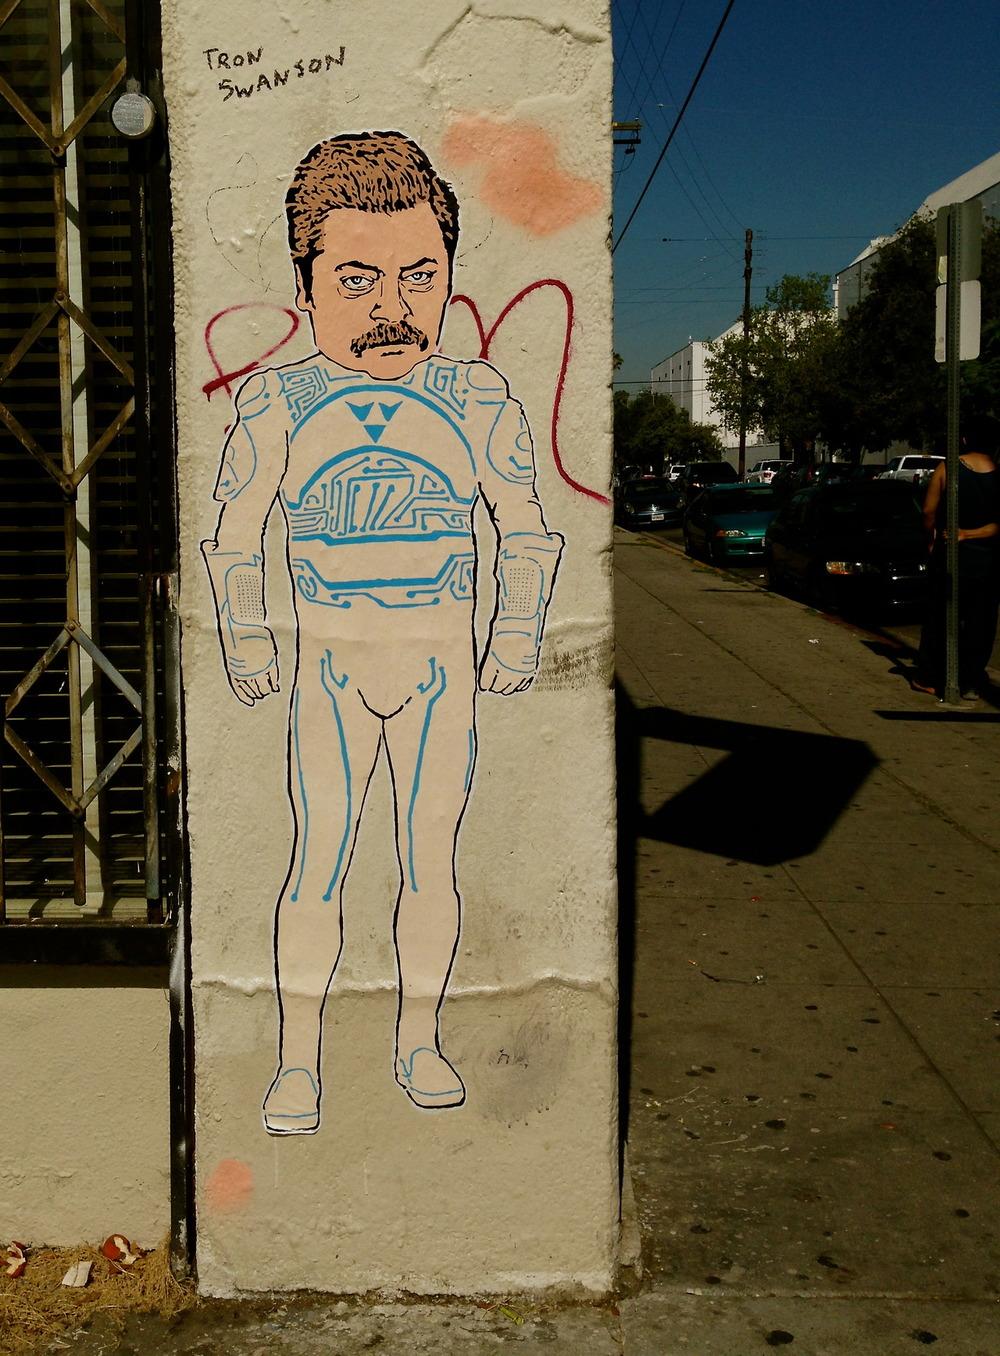 Tron Swanson, Los Angeles, CA